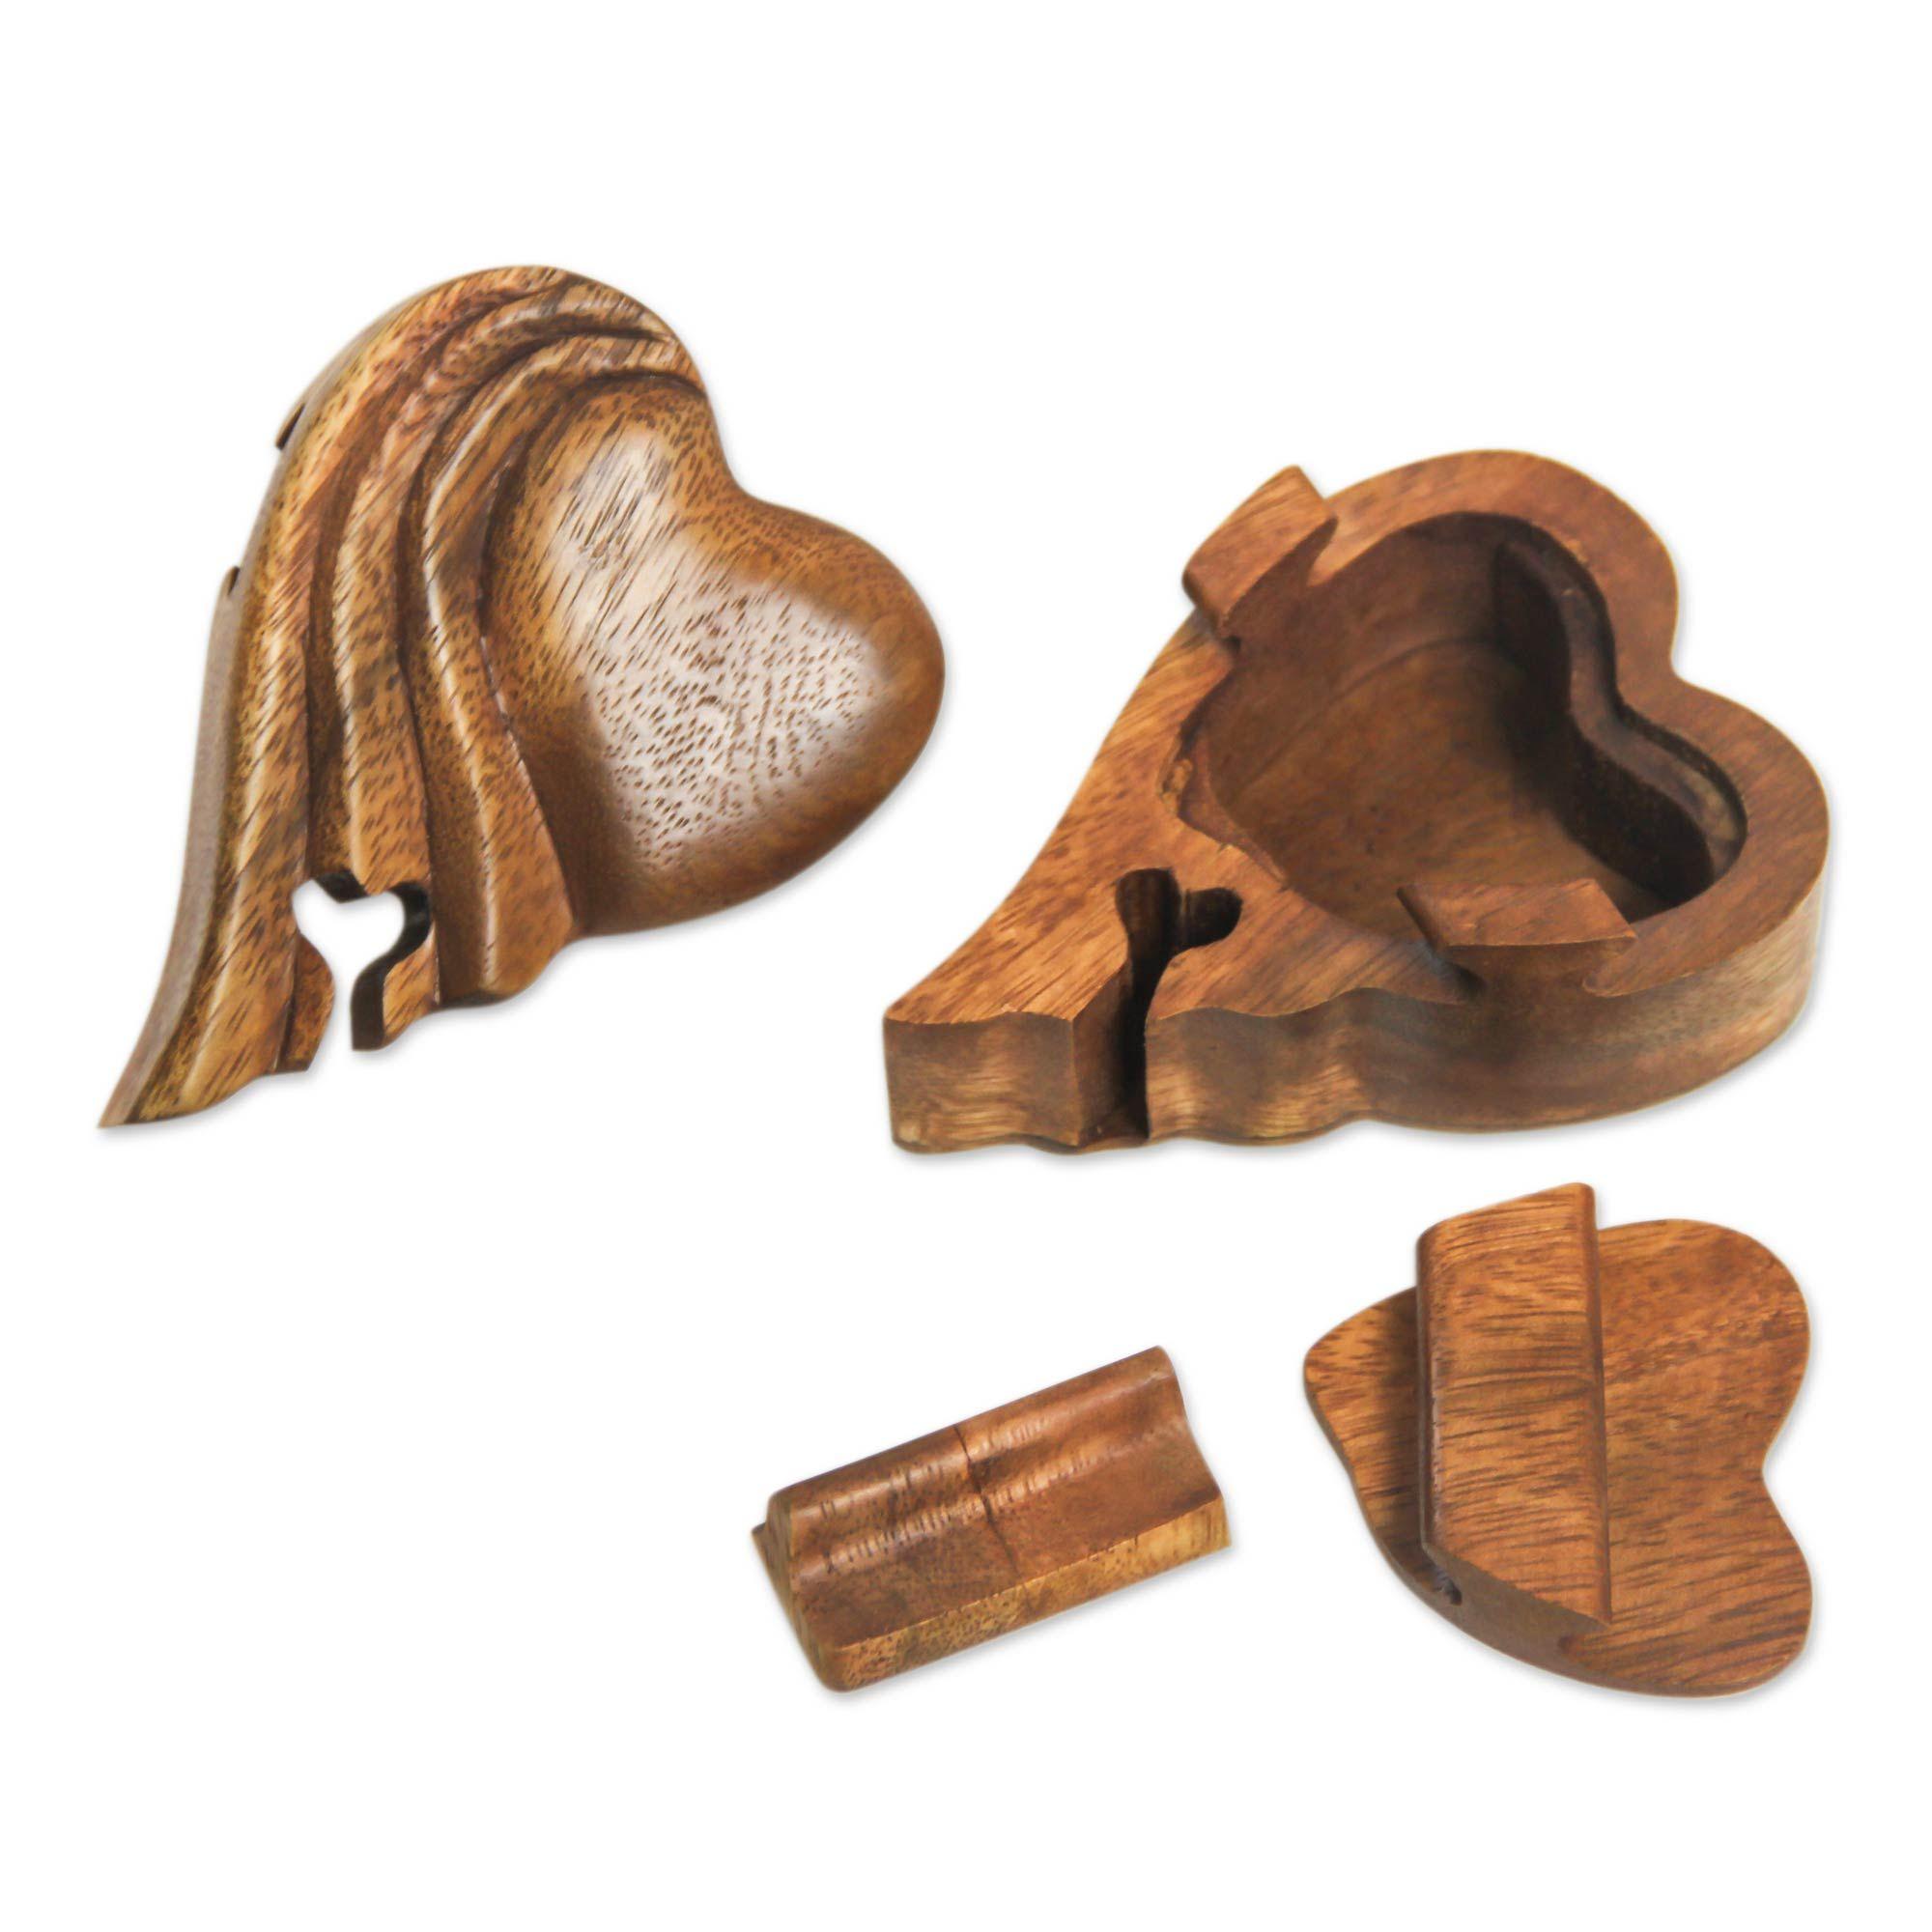 Heart Shaped Wood Puzzle Box Flying Heart Puzzle Box Wood Buy Wood